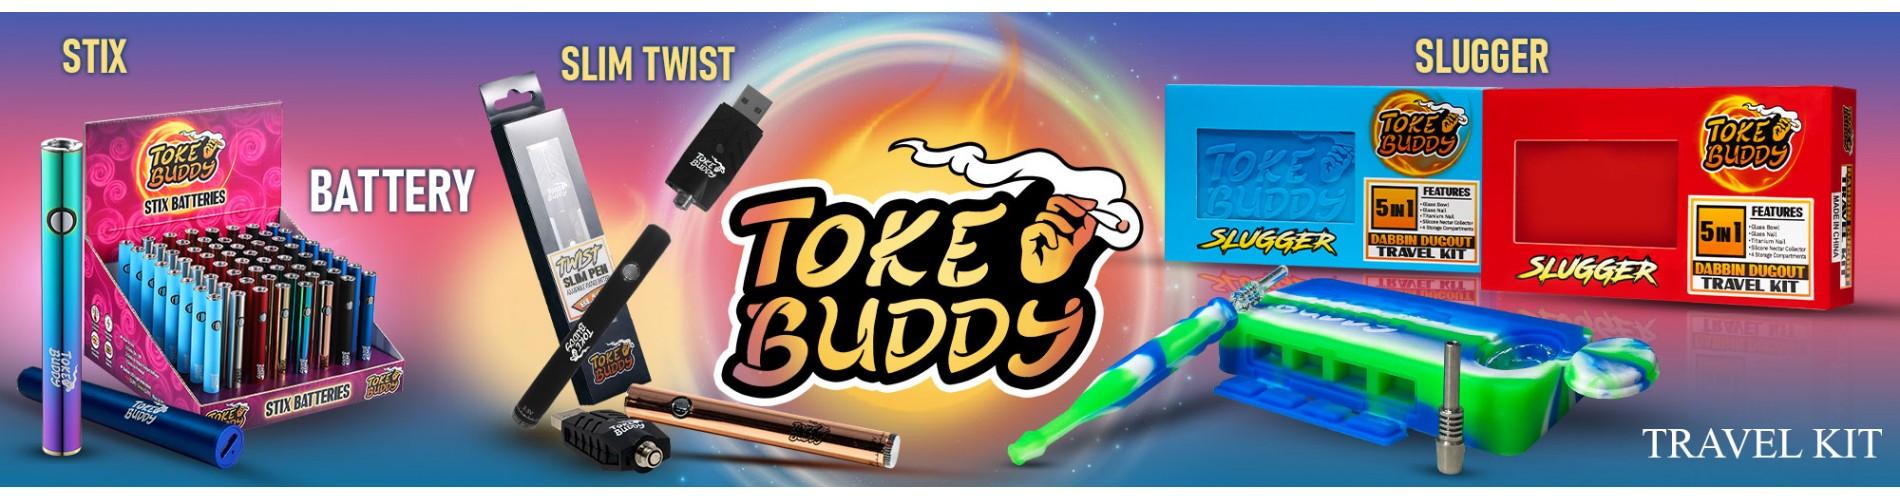 Toke Buddy Products, Stix BatterIes, Slim Twist Batteries, and Slugger Dabbin Dugout Kit